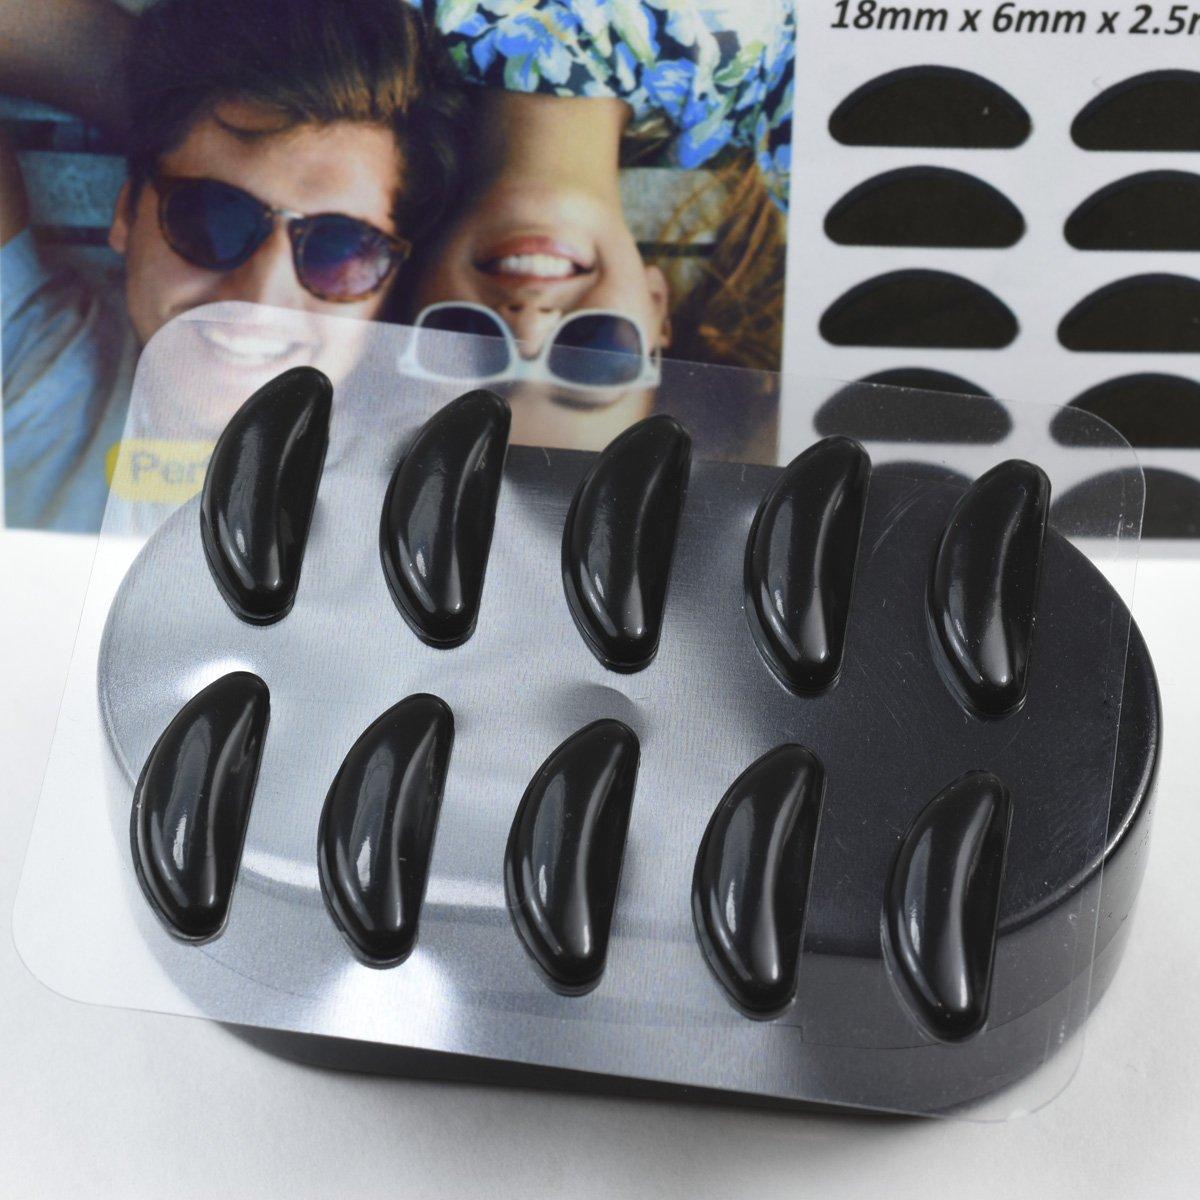 Amazon.com: Gms Optical® 1.8mm Anti-Slip Adhesive Contoured Soft ...